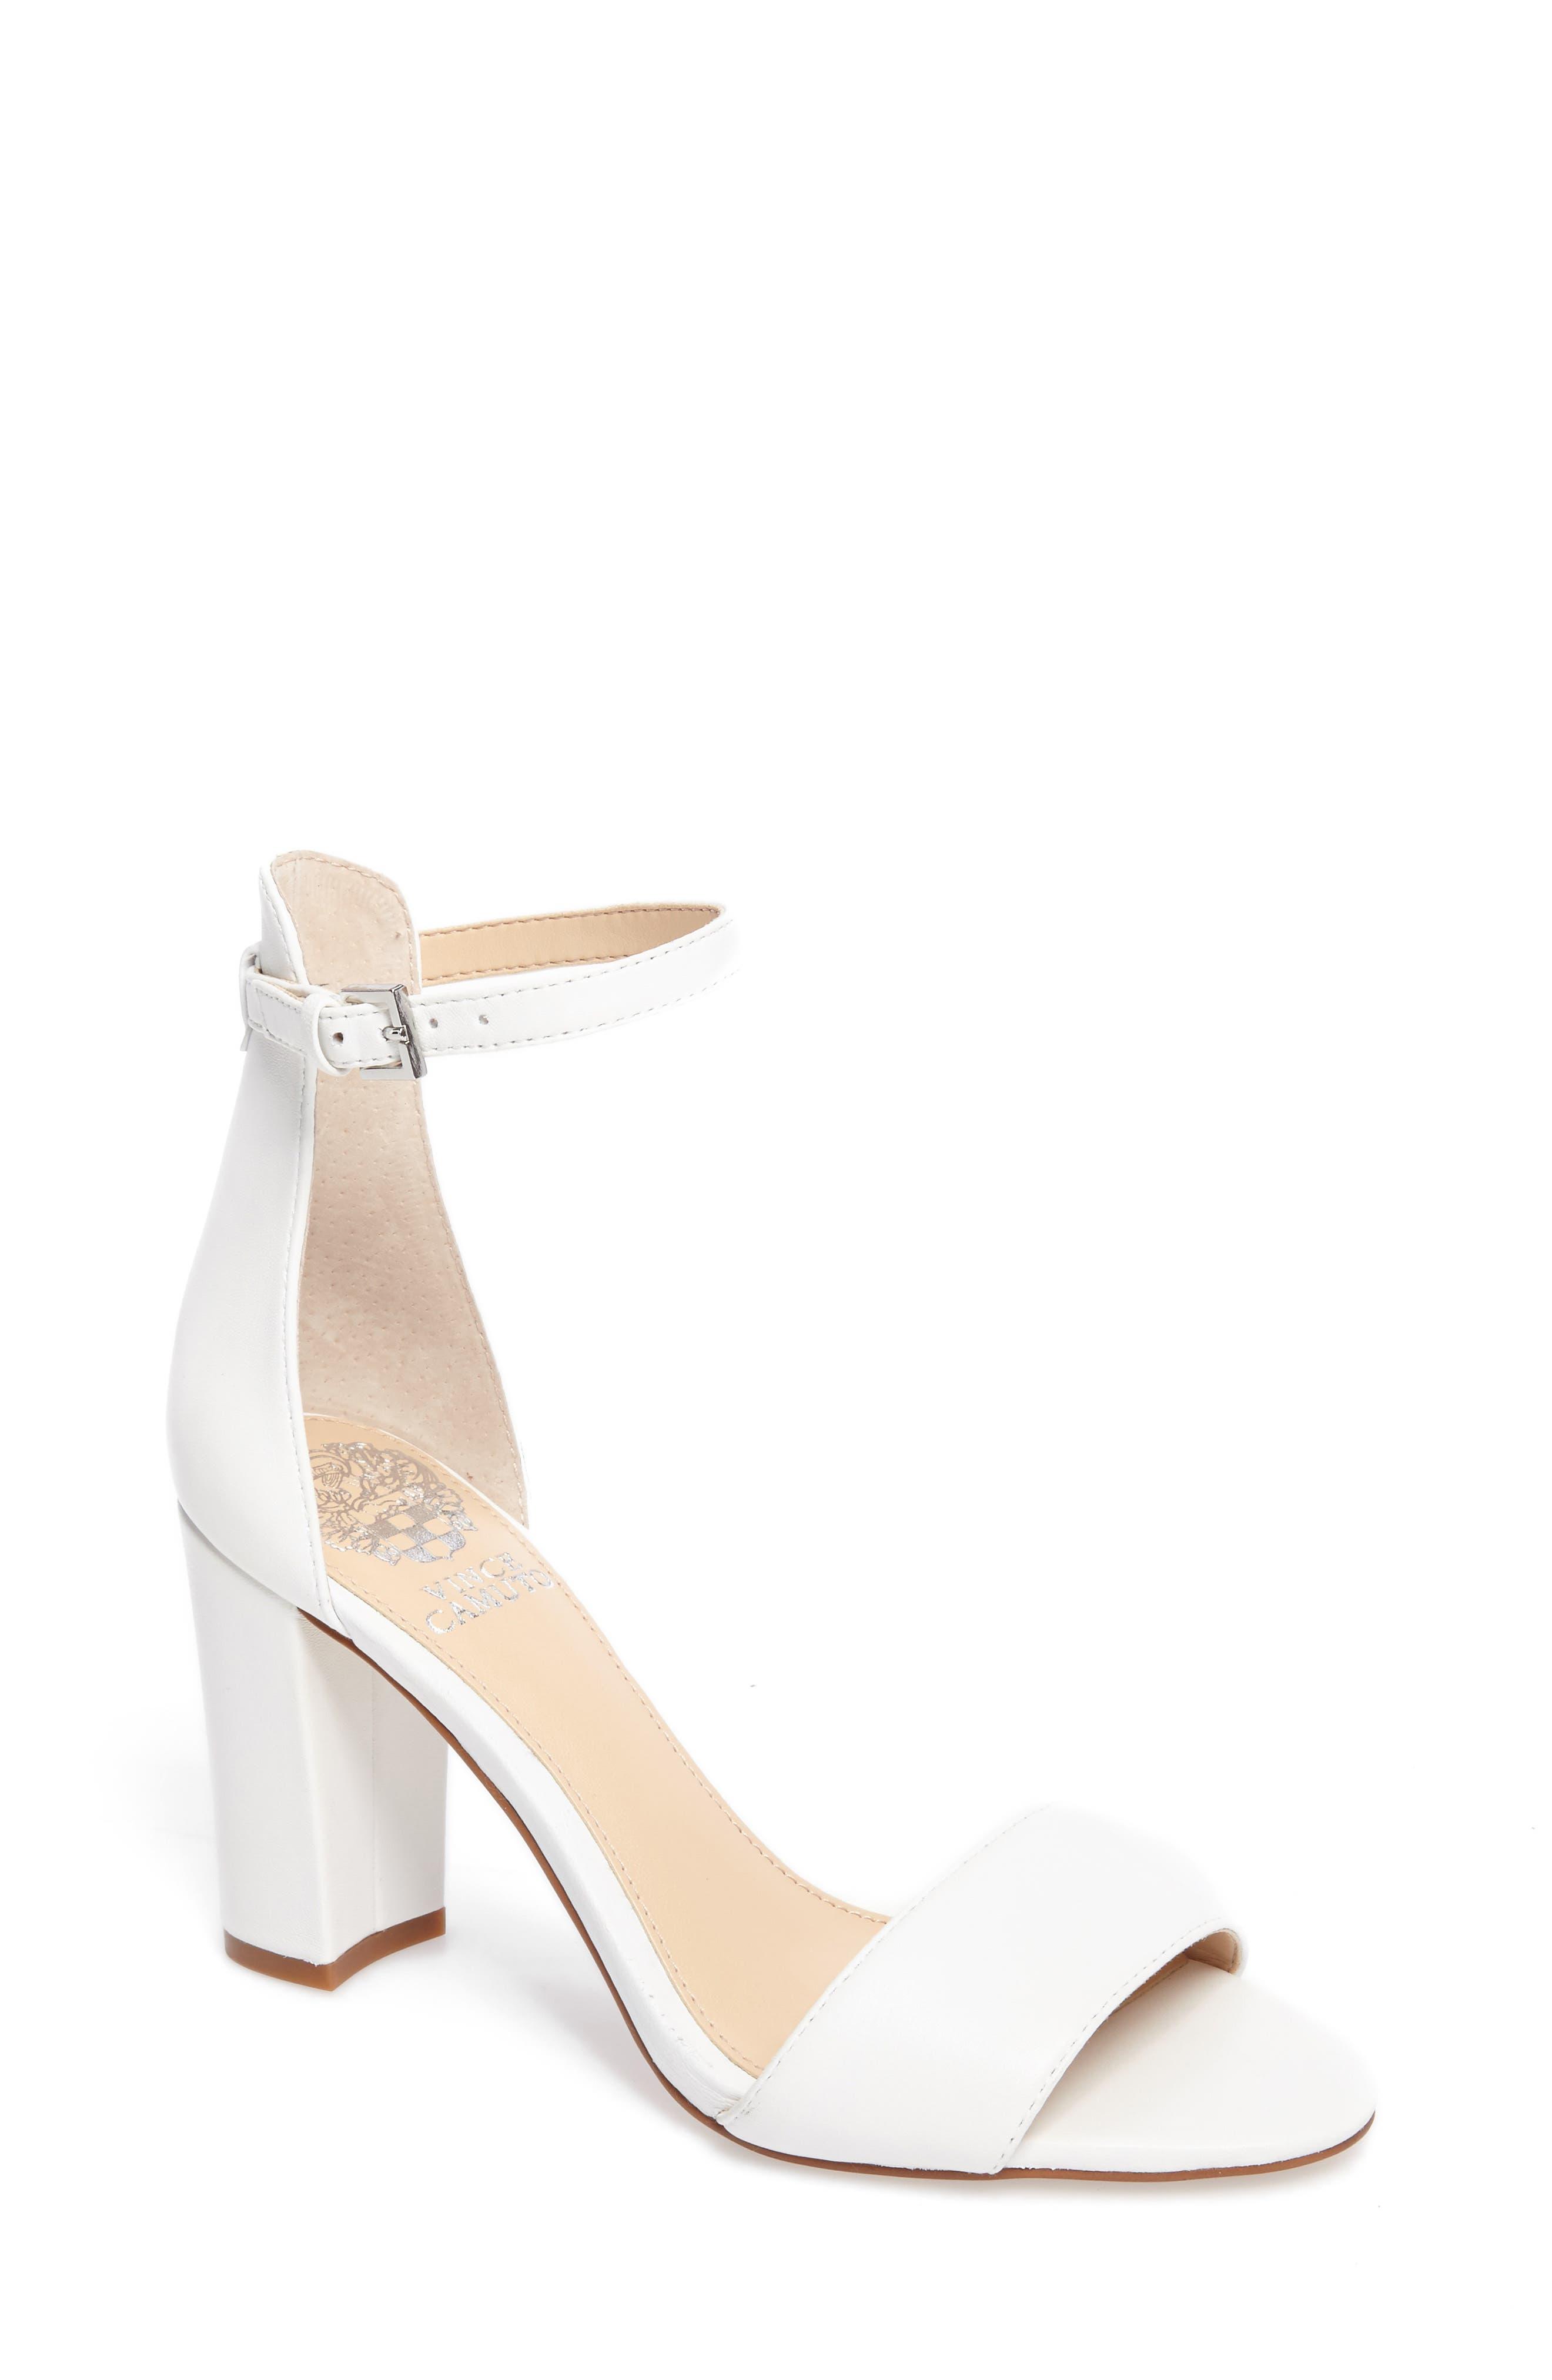 White Sandal Heels wXG4CK8j